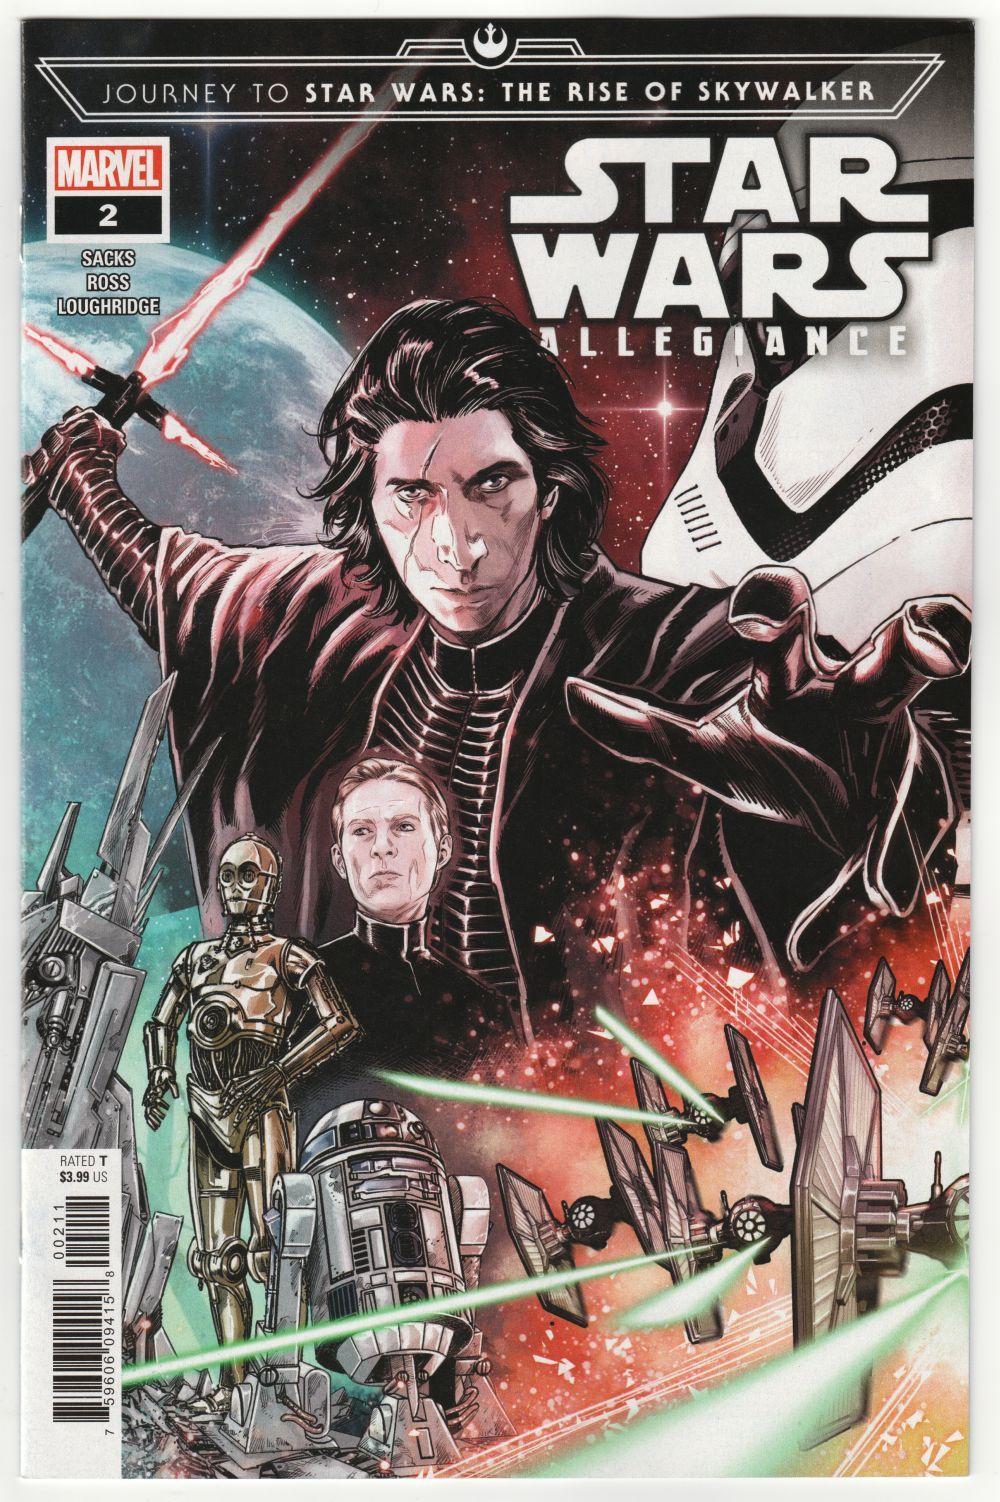 Journey To Star Wars Rise Of Skywalker Allegiance 2 Marvel 2019 Nm Star Wars Comics Star Wars Books Star Wars